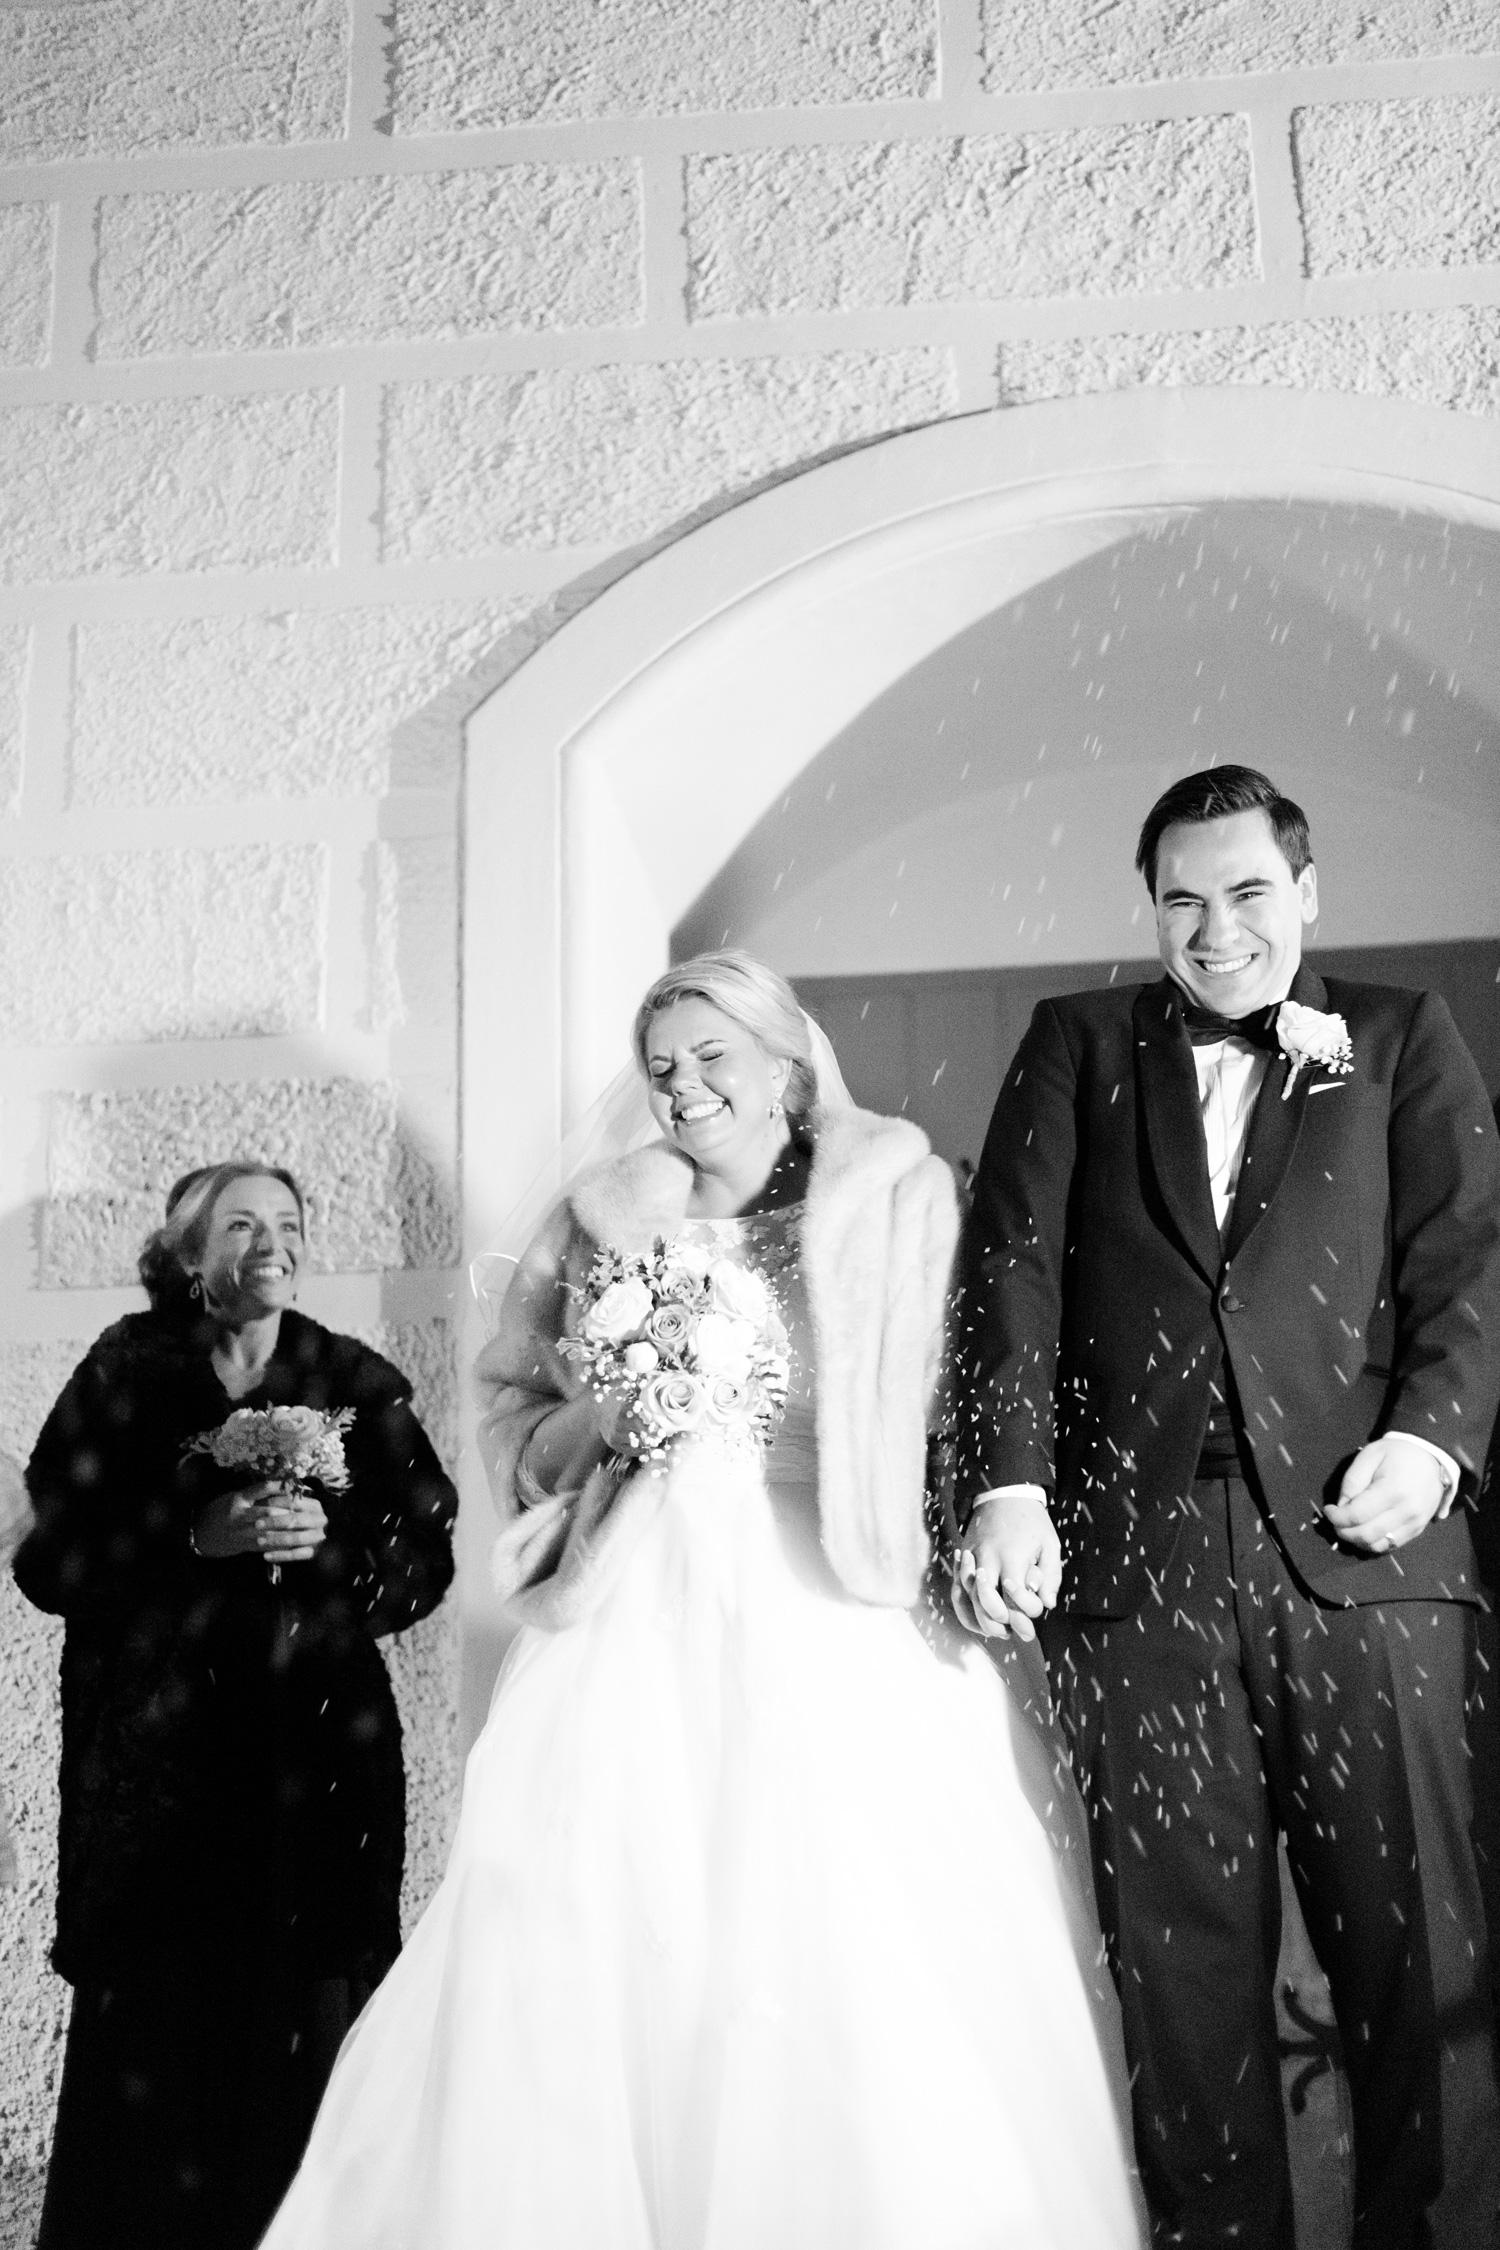 039-sweden-vidbynäs-winter-wedding-photographer.jpg